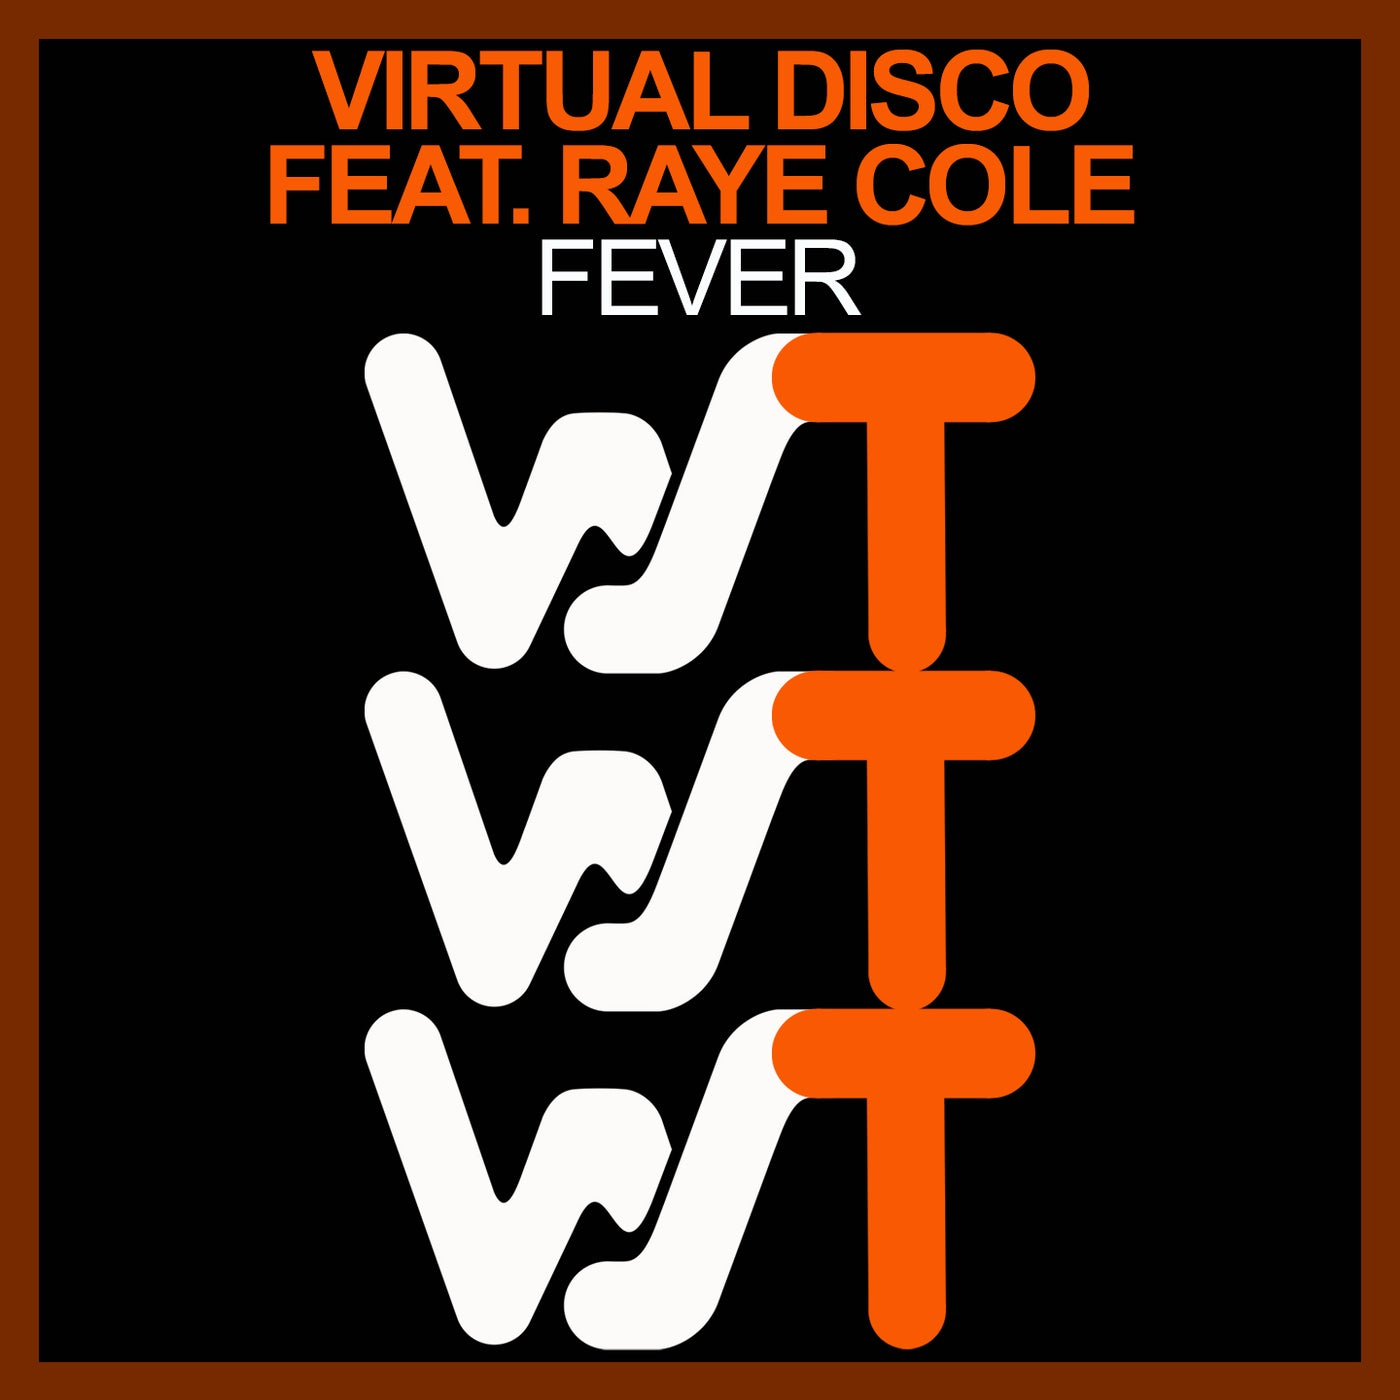 Fever Feat. Raye Cole (Original Mix)